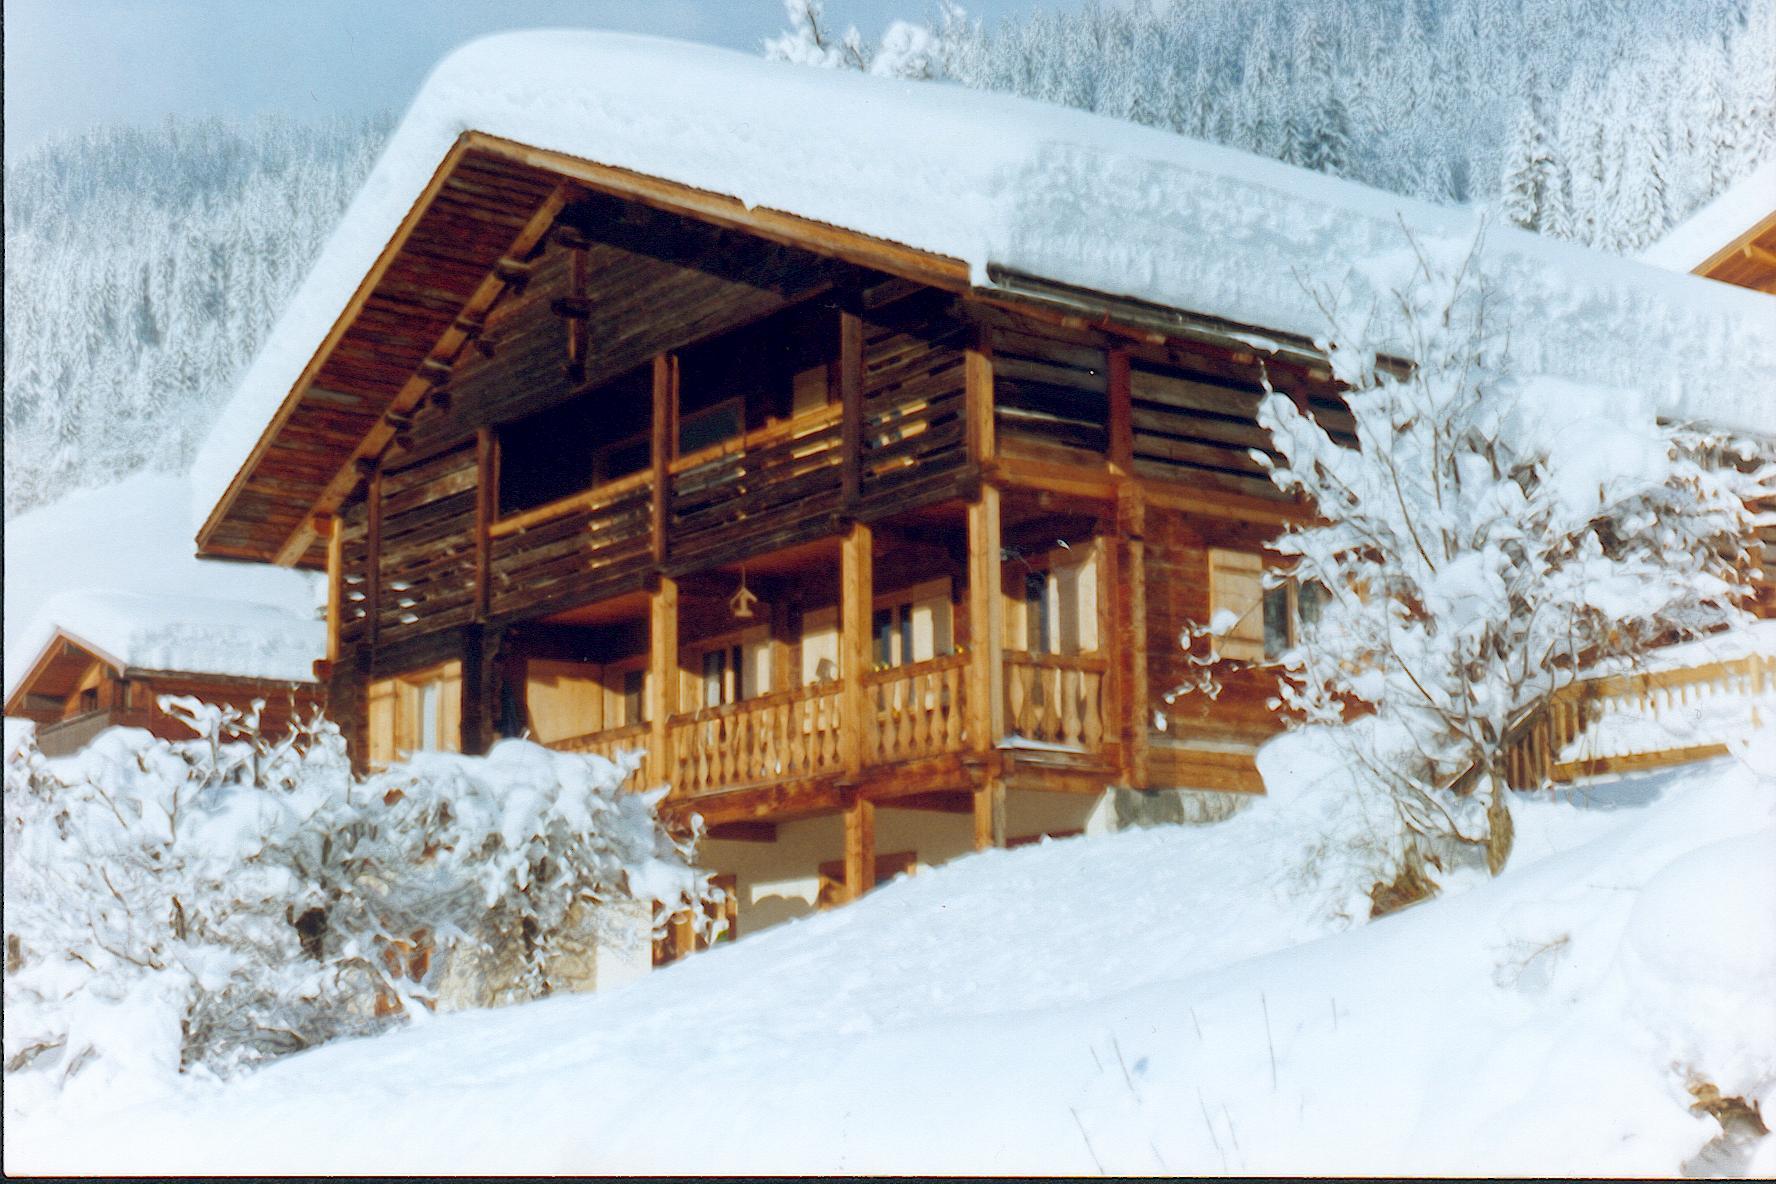 Location appartement ski le grand bornand pas cher - Office du tourisme le grand bornand village ...